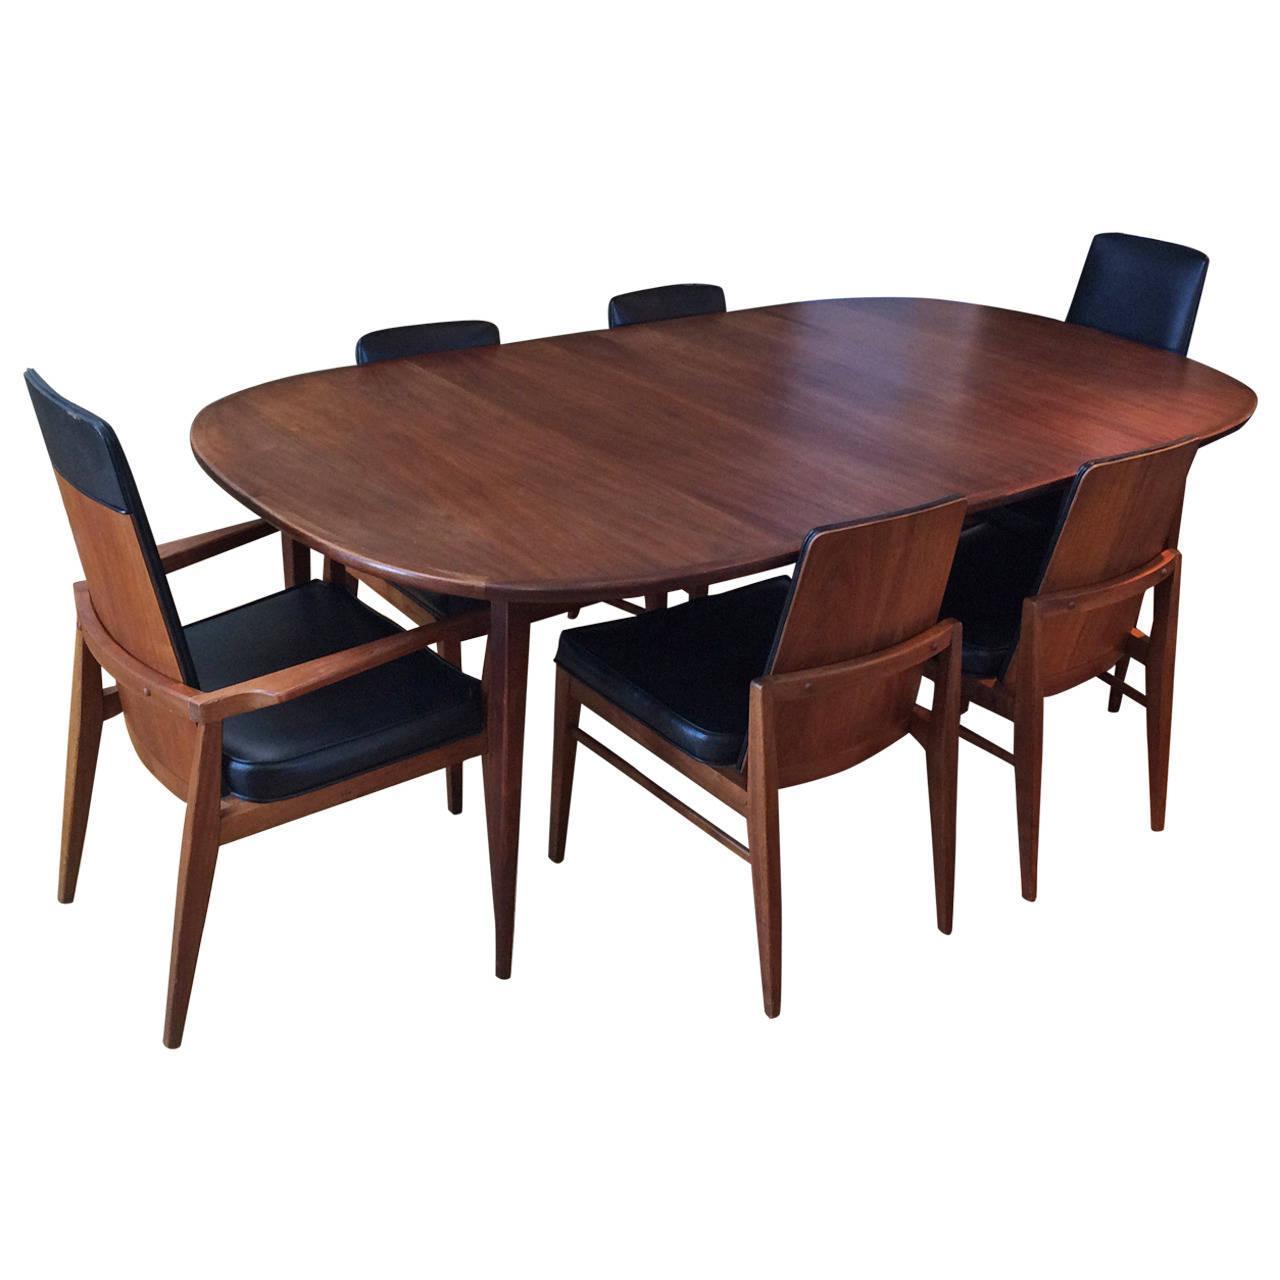 Mid Century Modern Dining Set: Mid-Century Modern Walnut Dining Set